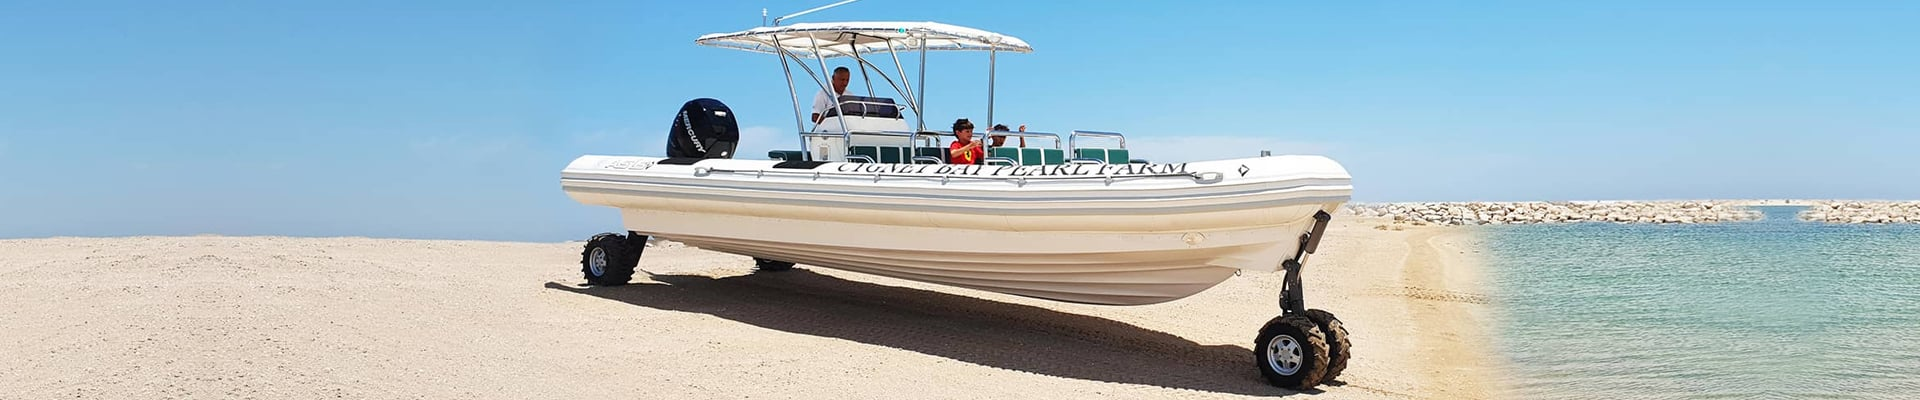 Amphibious-Transport-9.8m-Boats